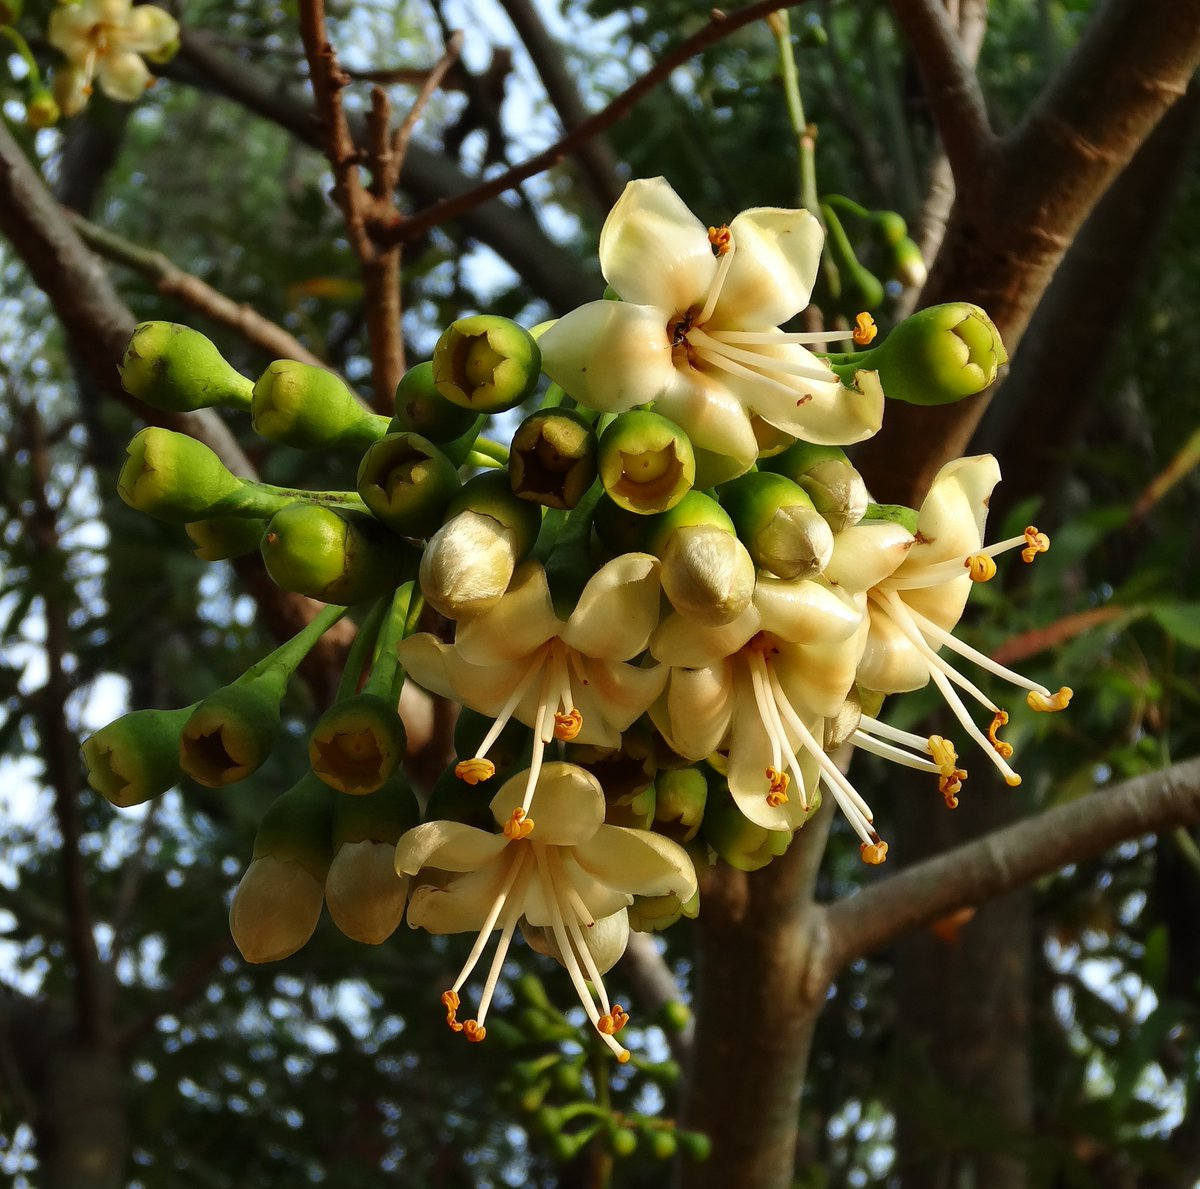 Flowers of Sri Lanka on Twitter: